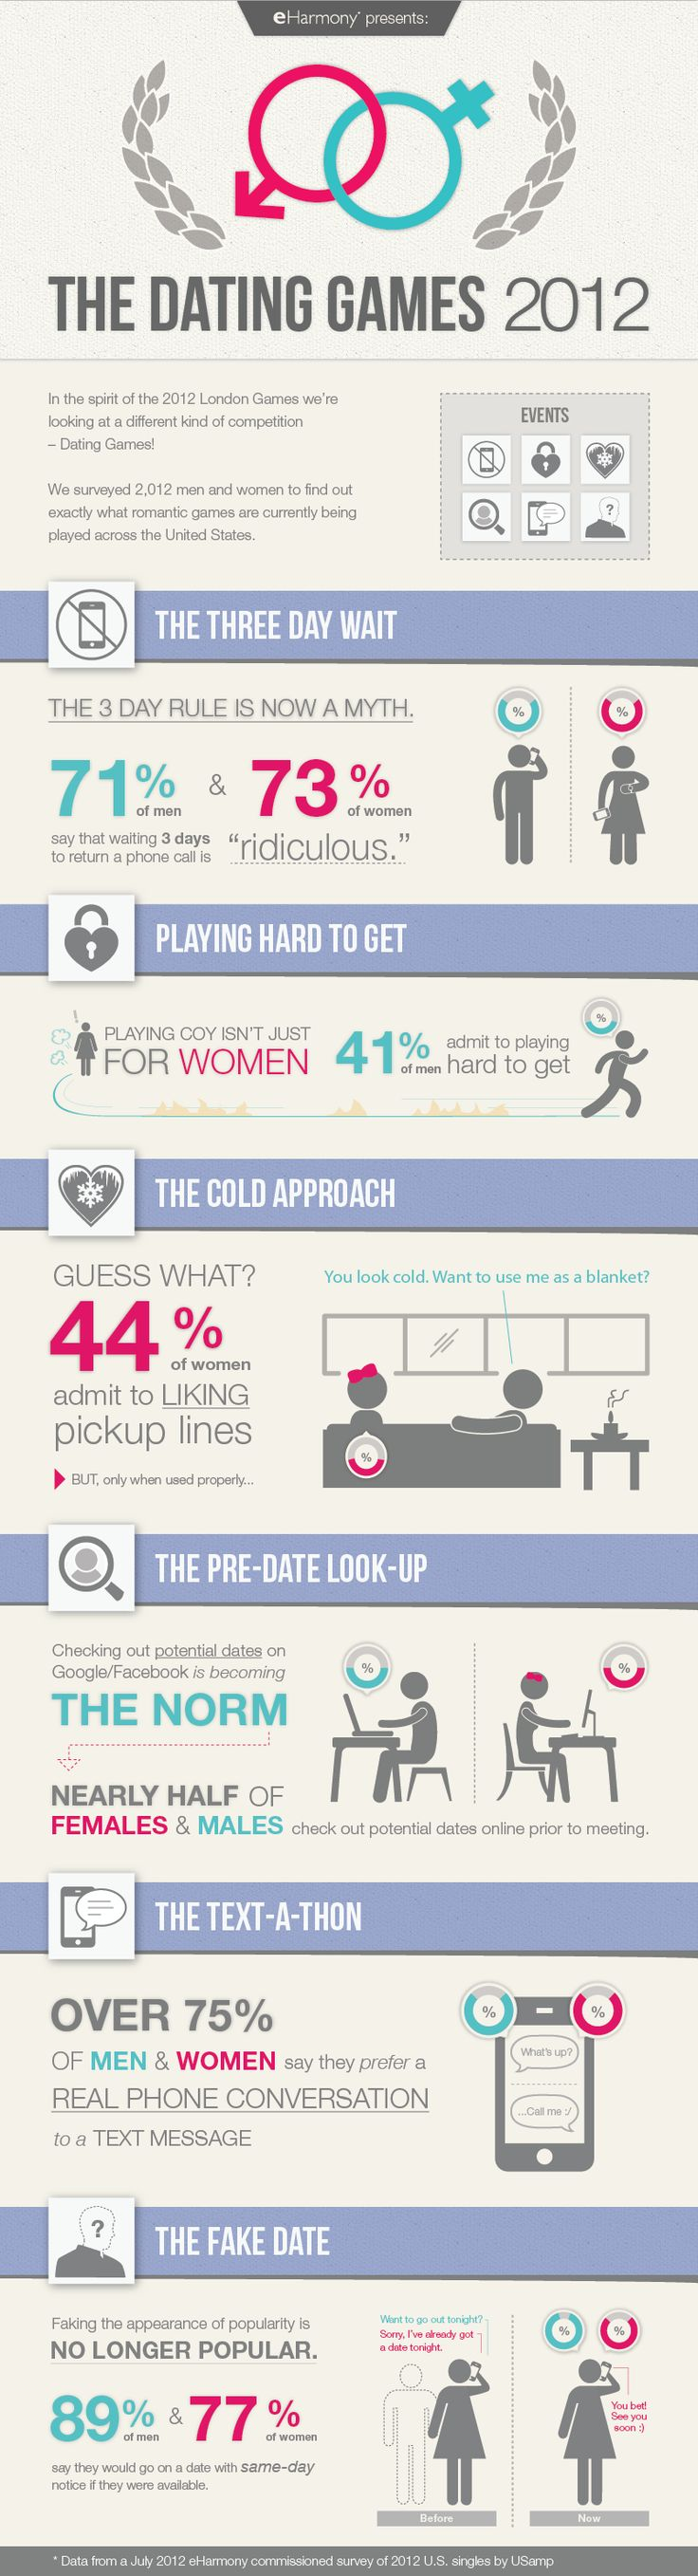 9 Common Senior Dating Mistakes